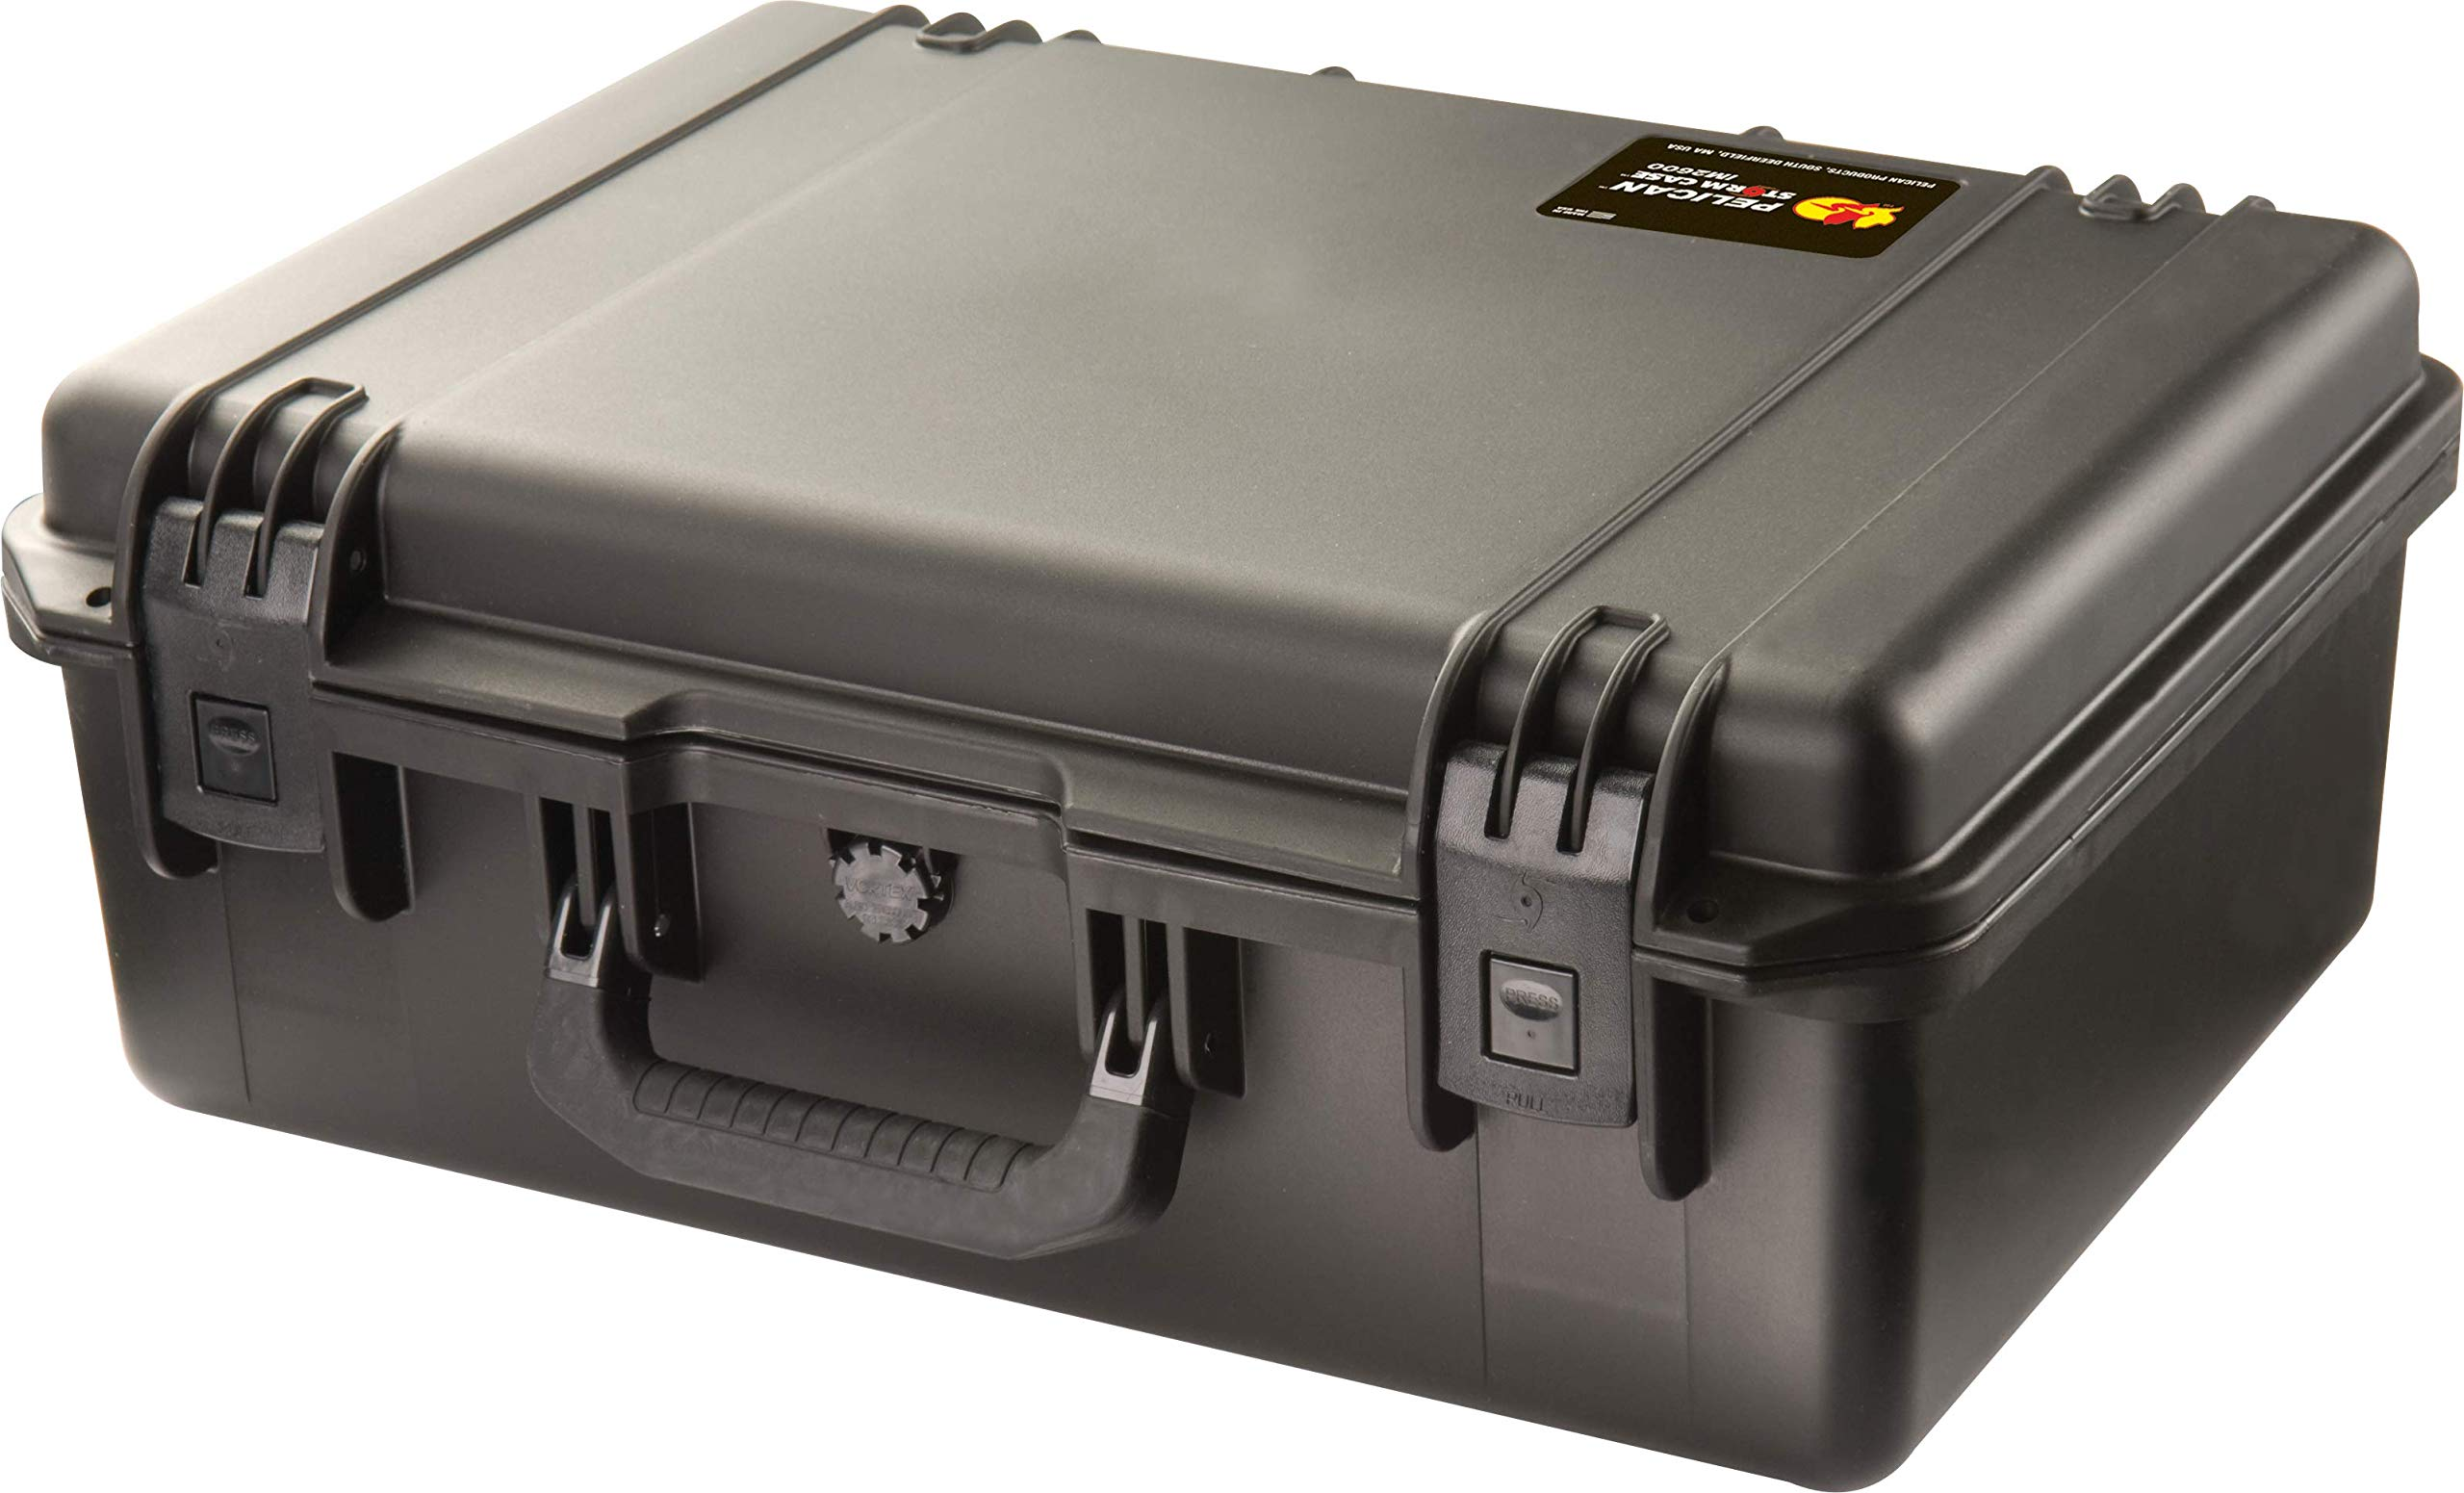 Waterproof Case (Dry Box) | Pelican Storm iM2600 Case With Foam (Black)